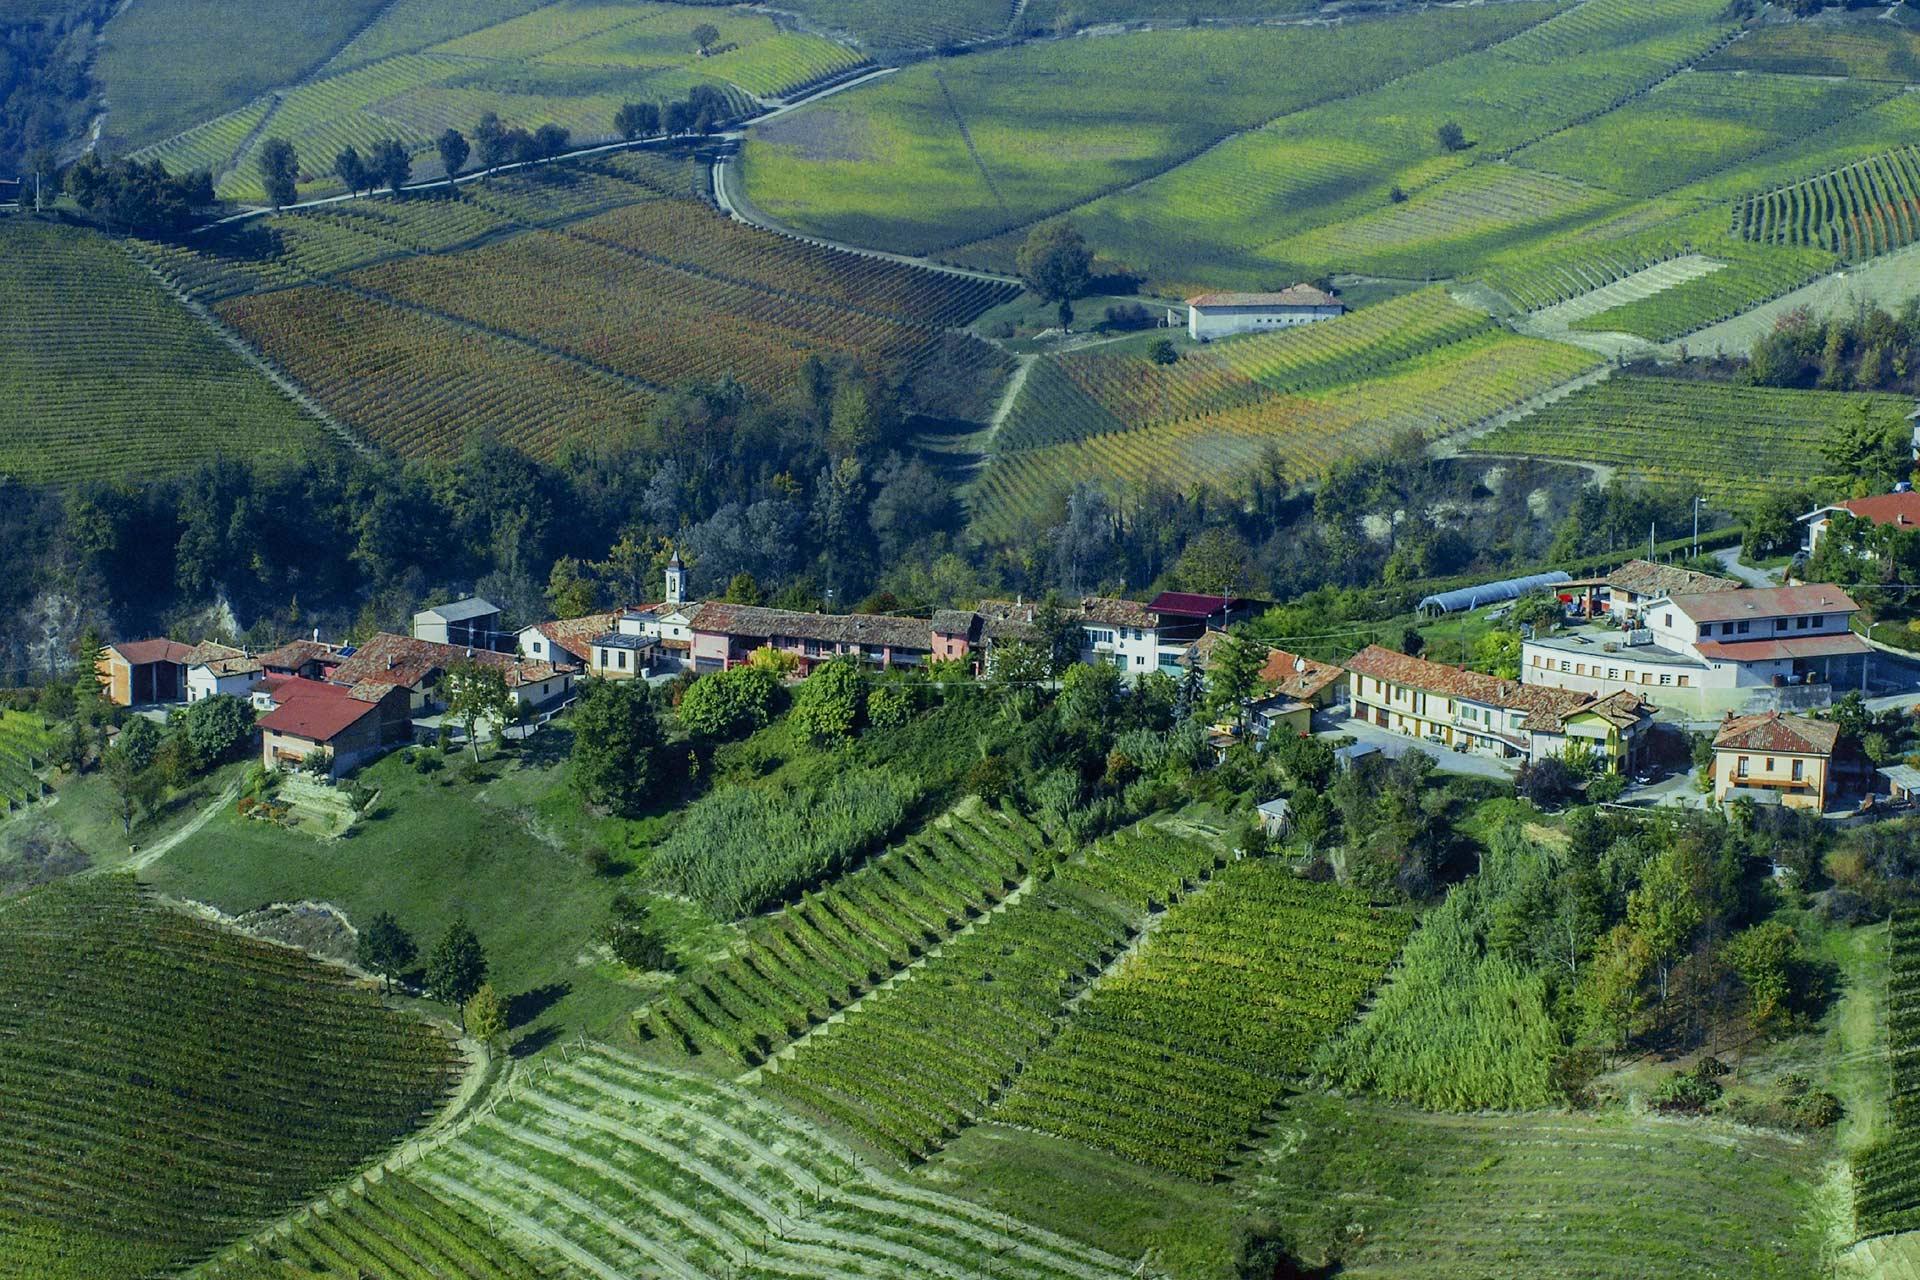 Vendita vini on line Raineri azienda